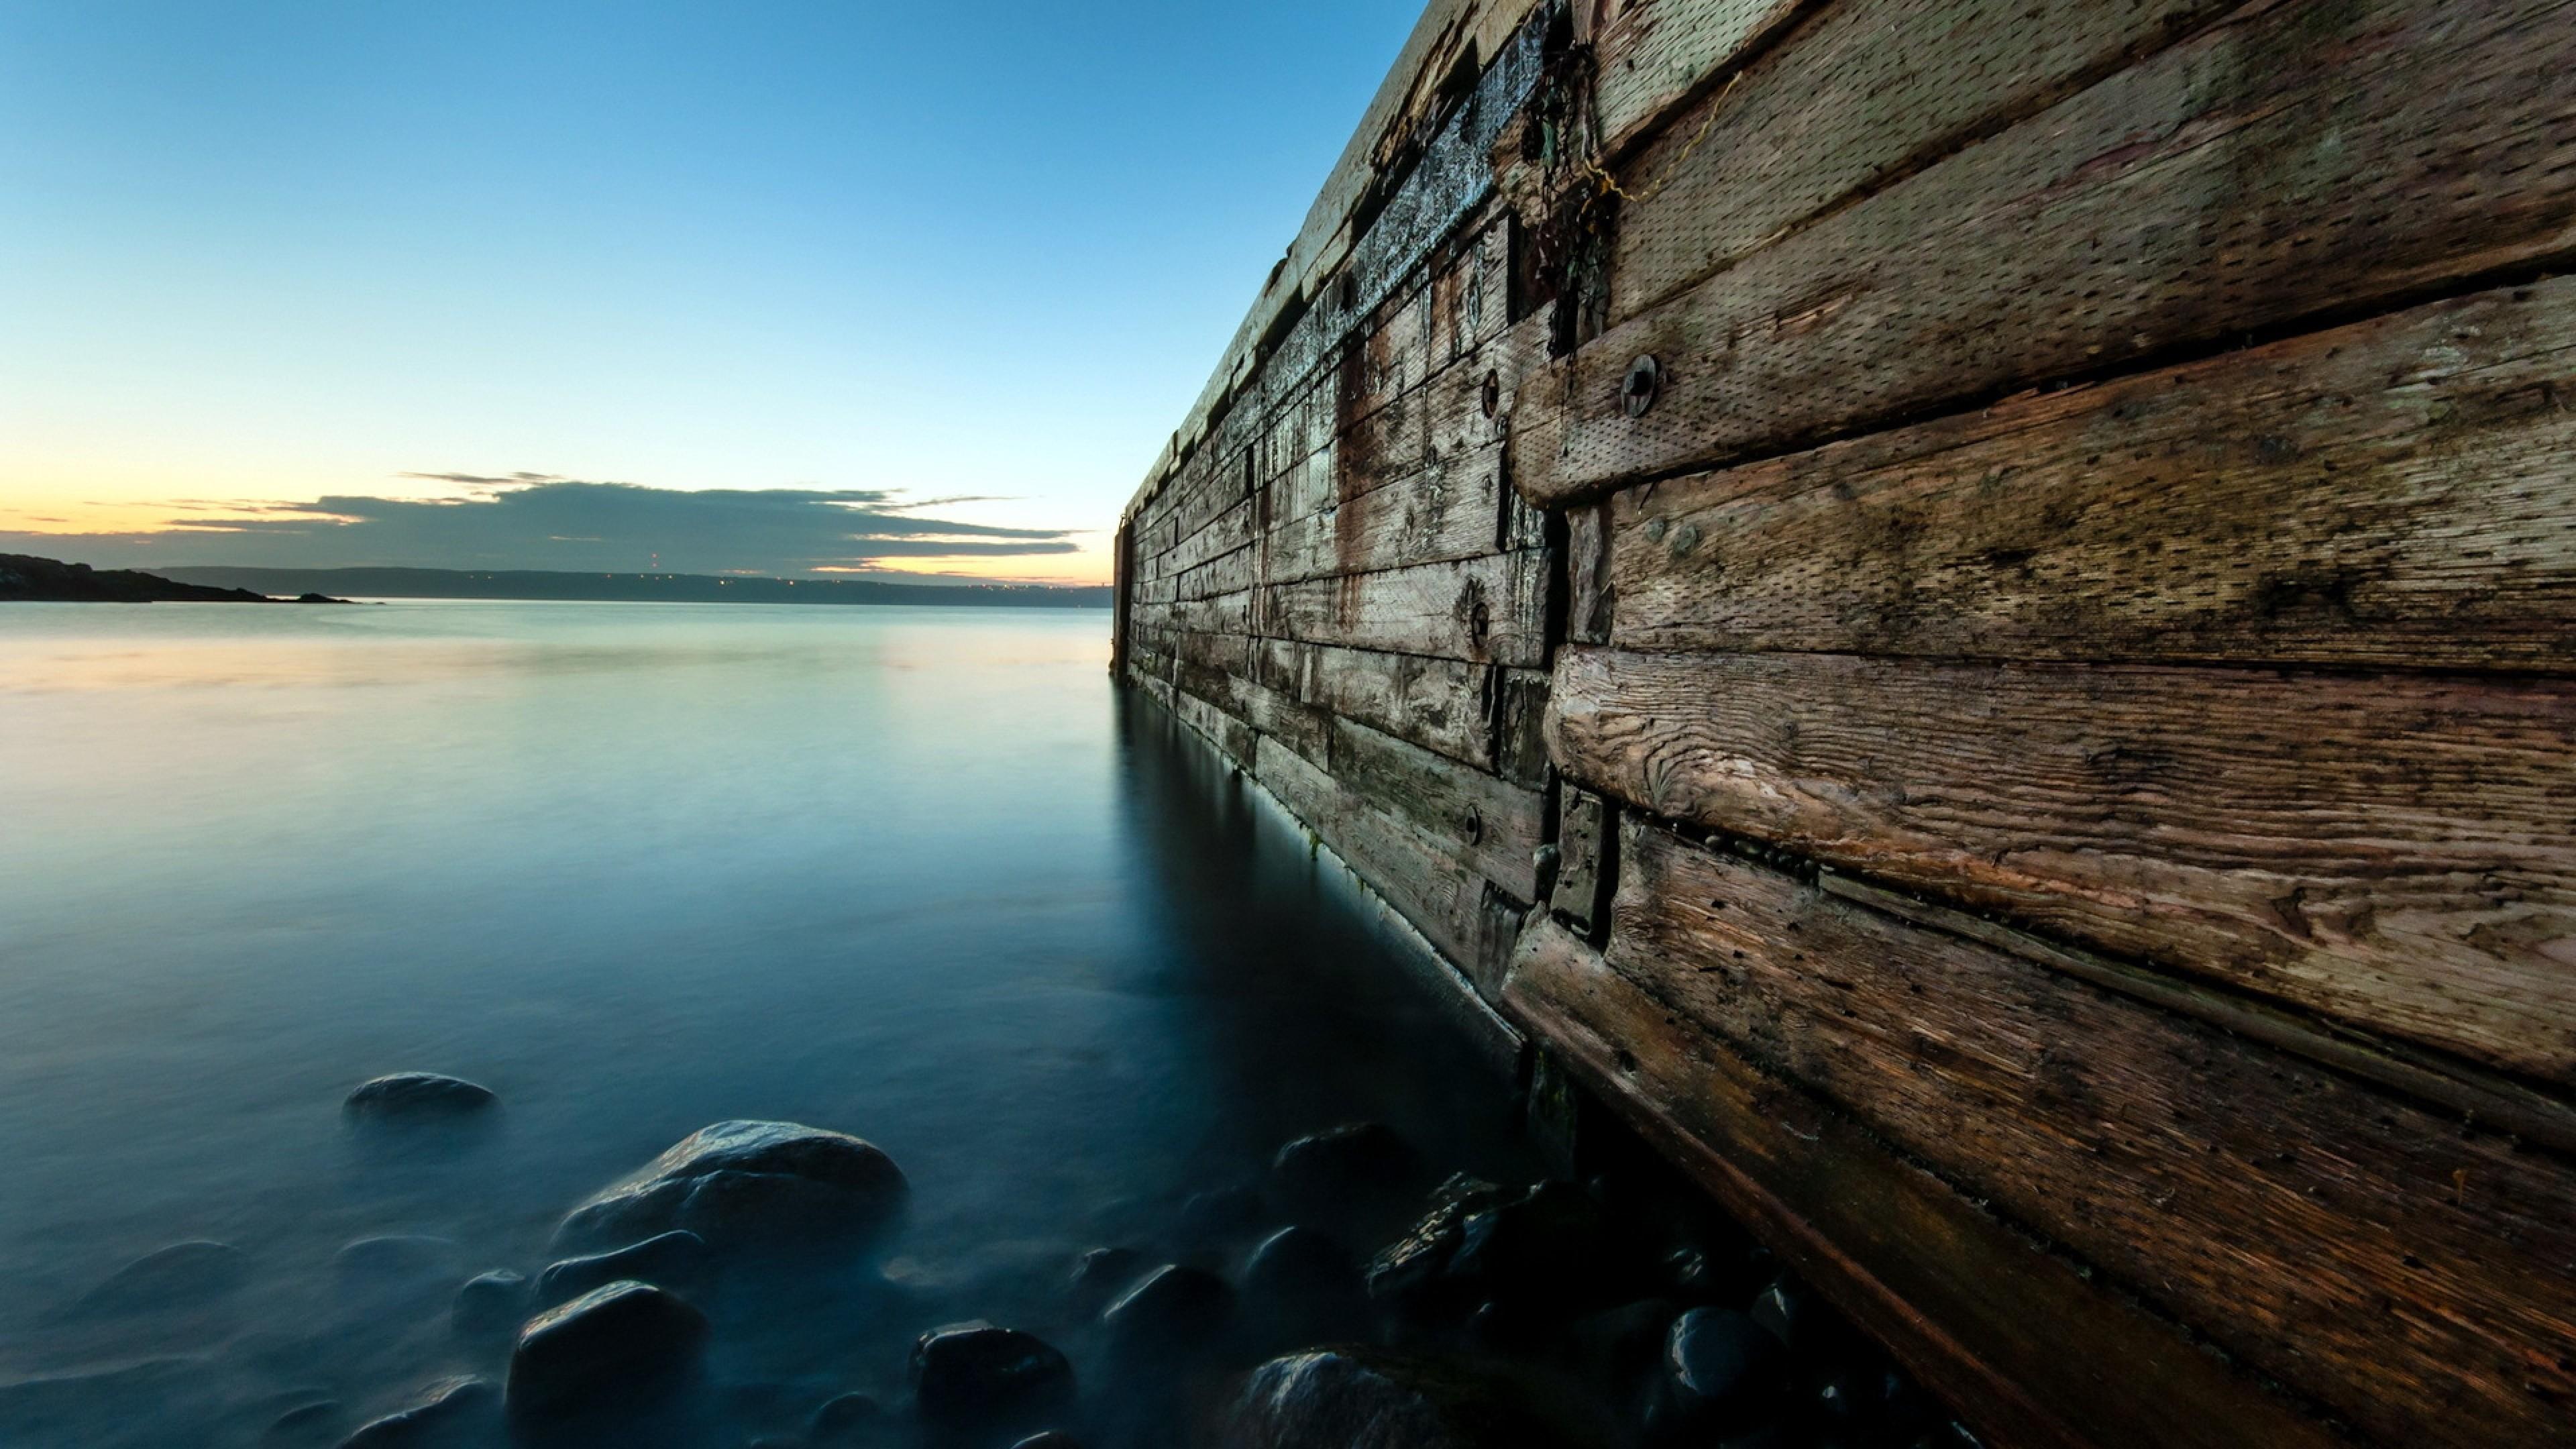 Download Wallpaper Night, Lake, Bridge, Landscape 4k - 4k Hd Wallpapers Landscape - HD Wallpaper